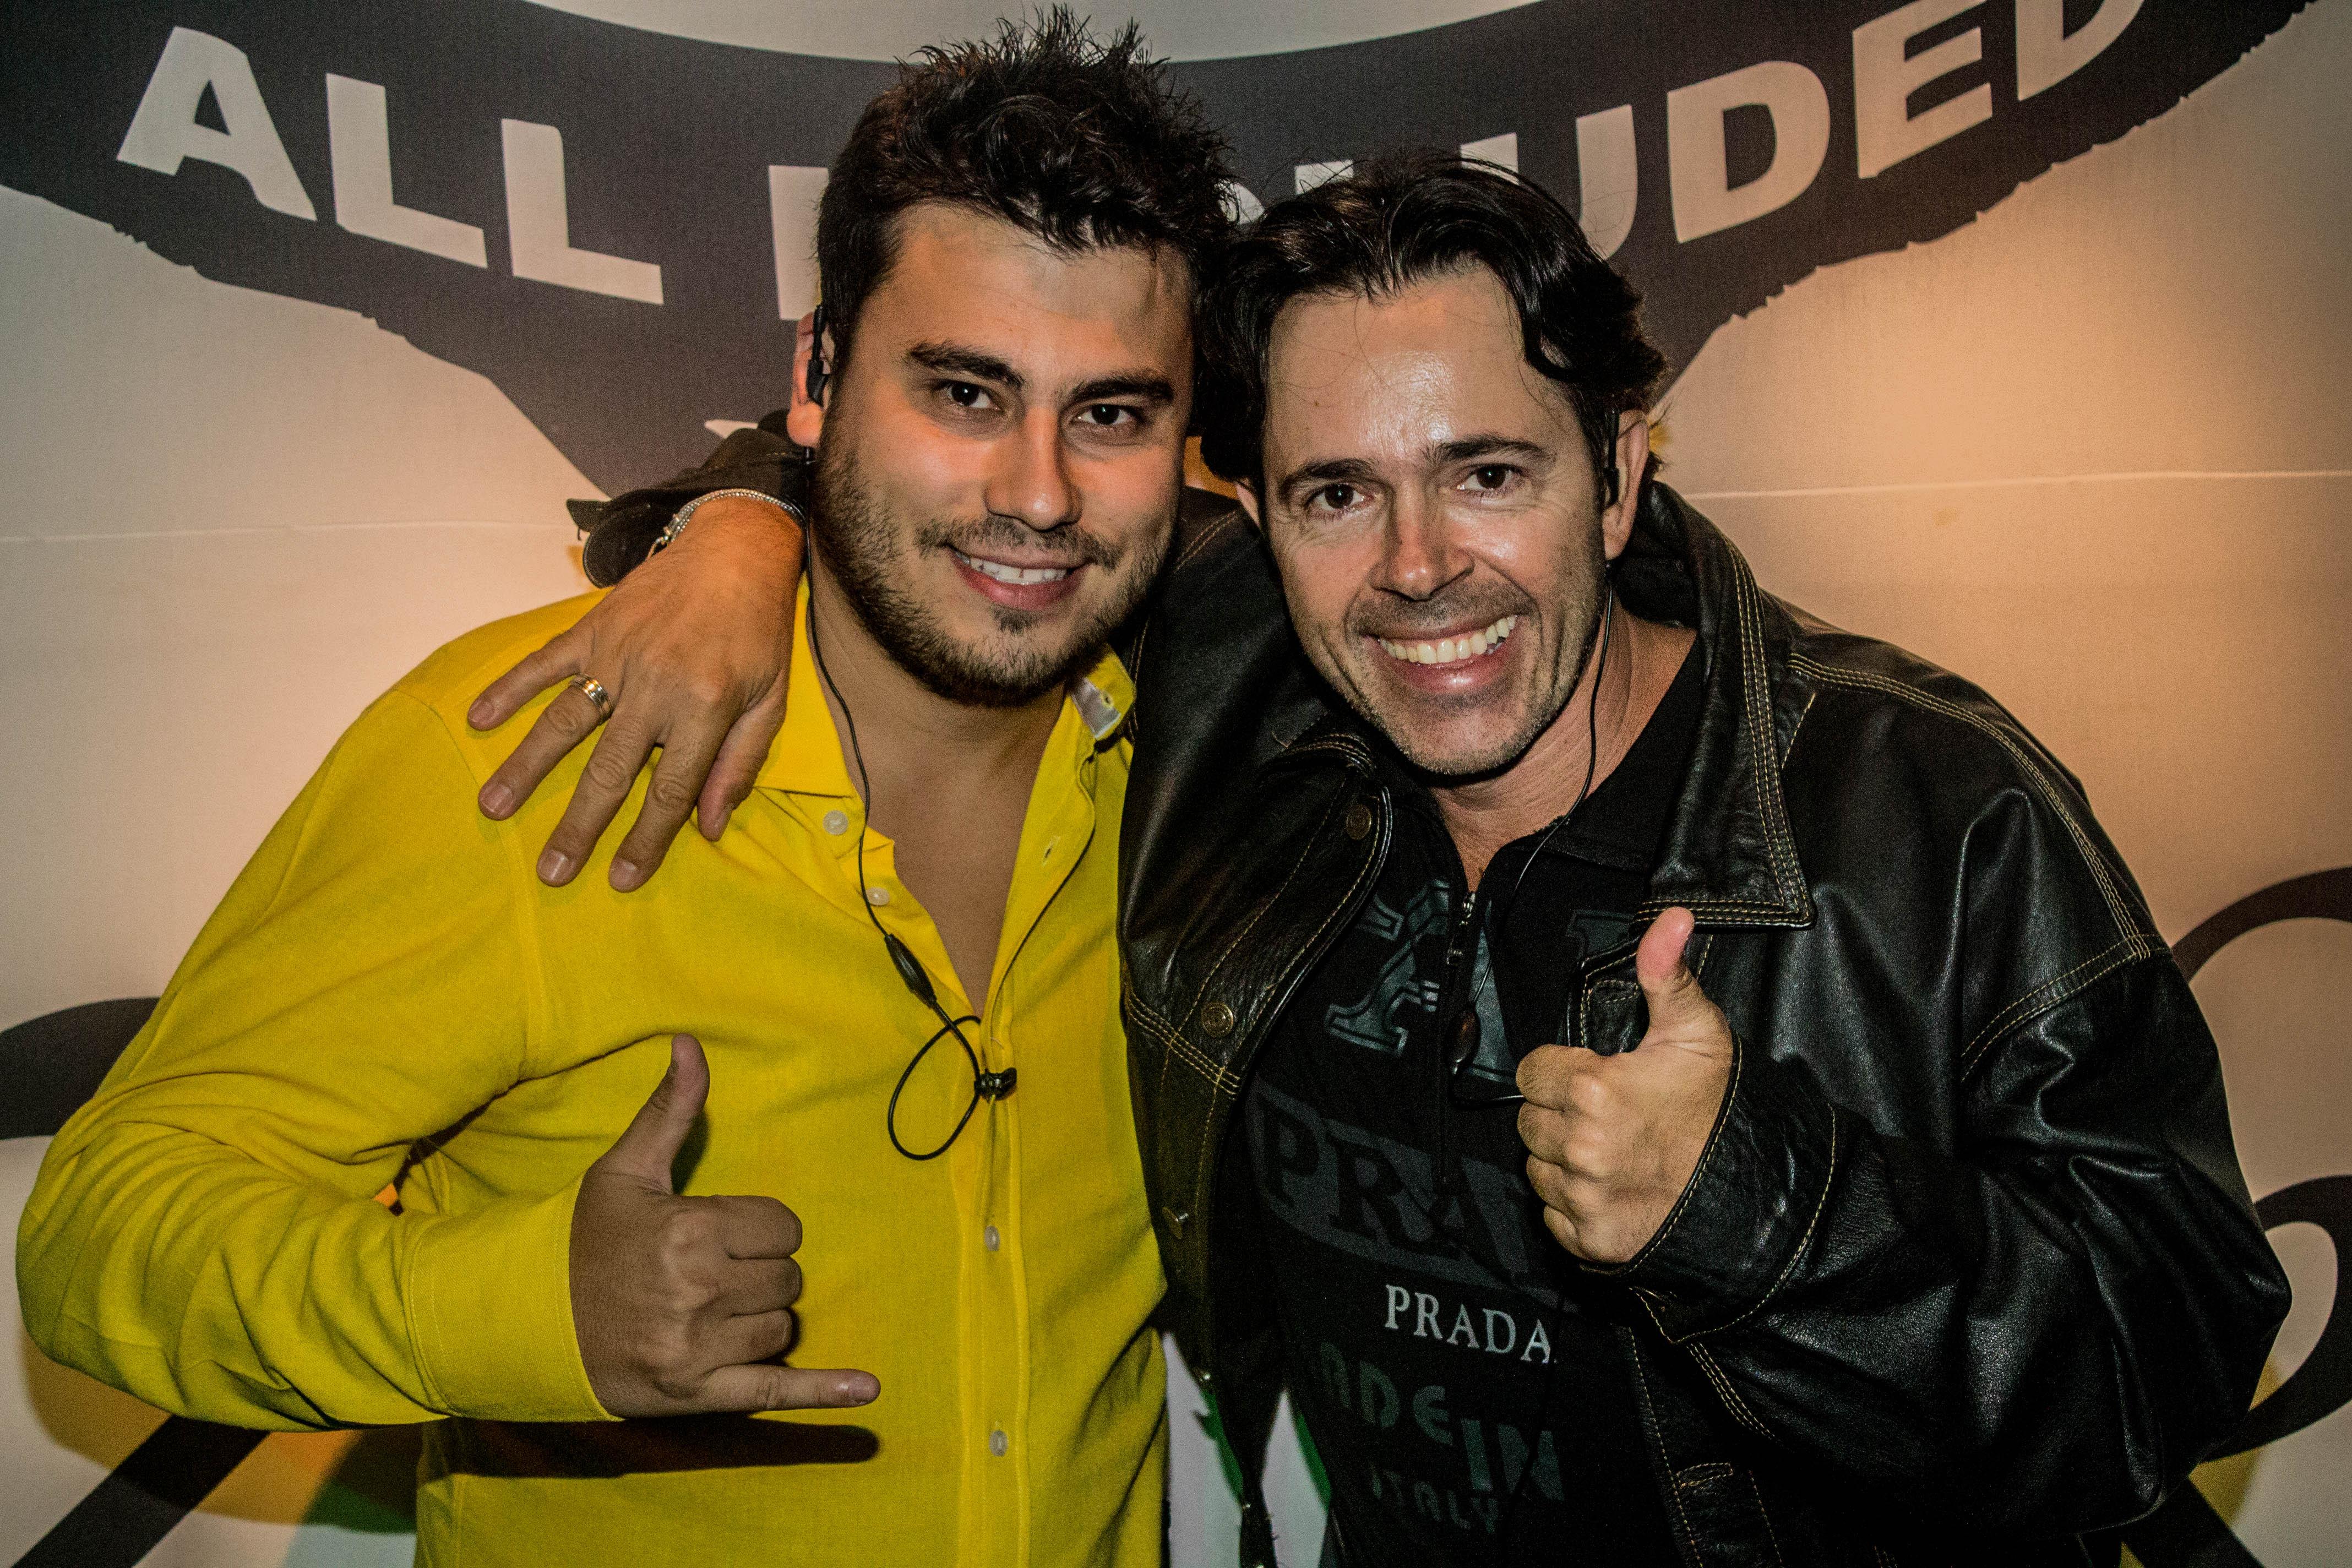 Guilherme Ferraz e Biel Balieiro CAPA